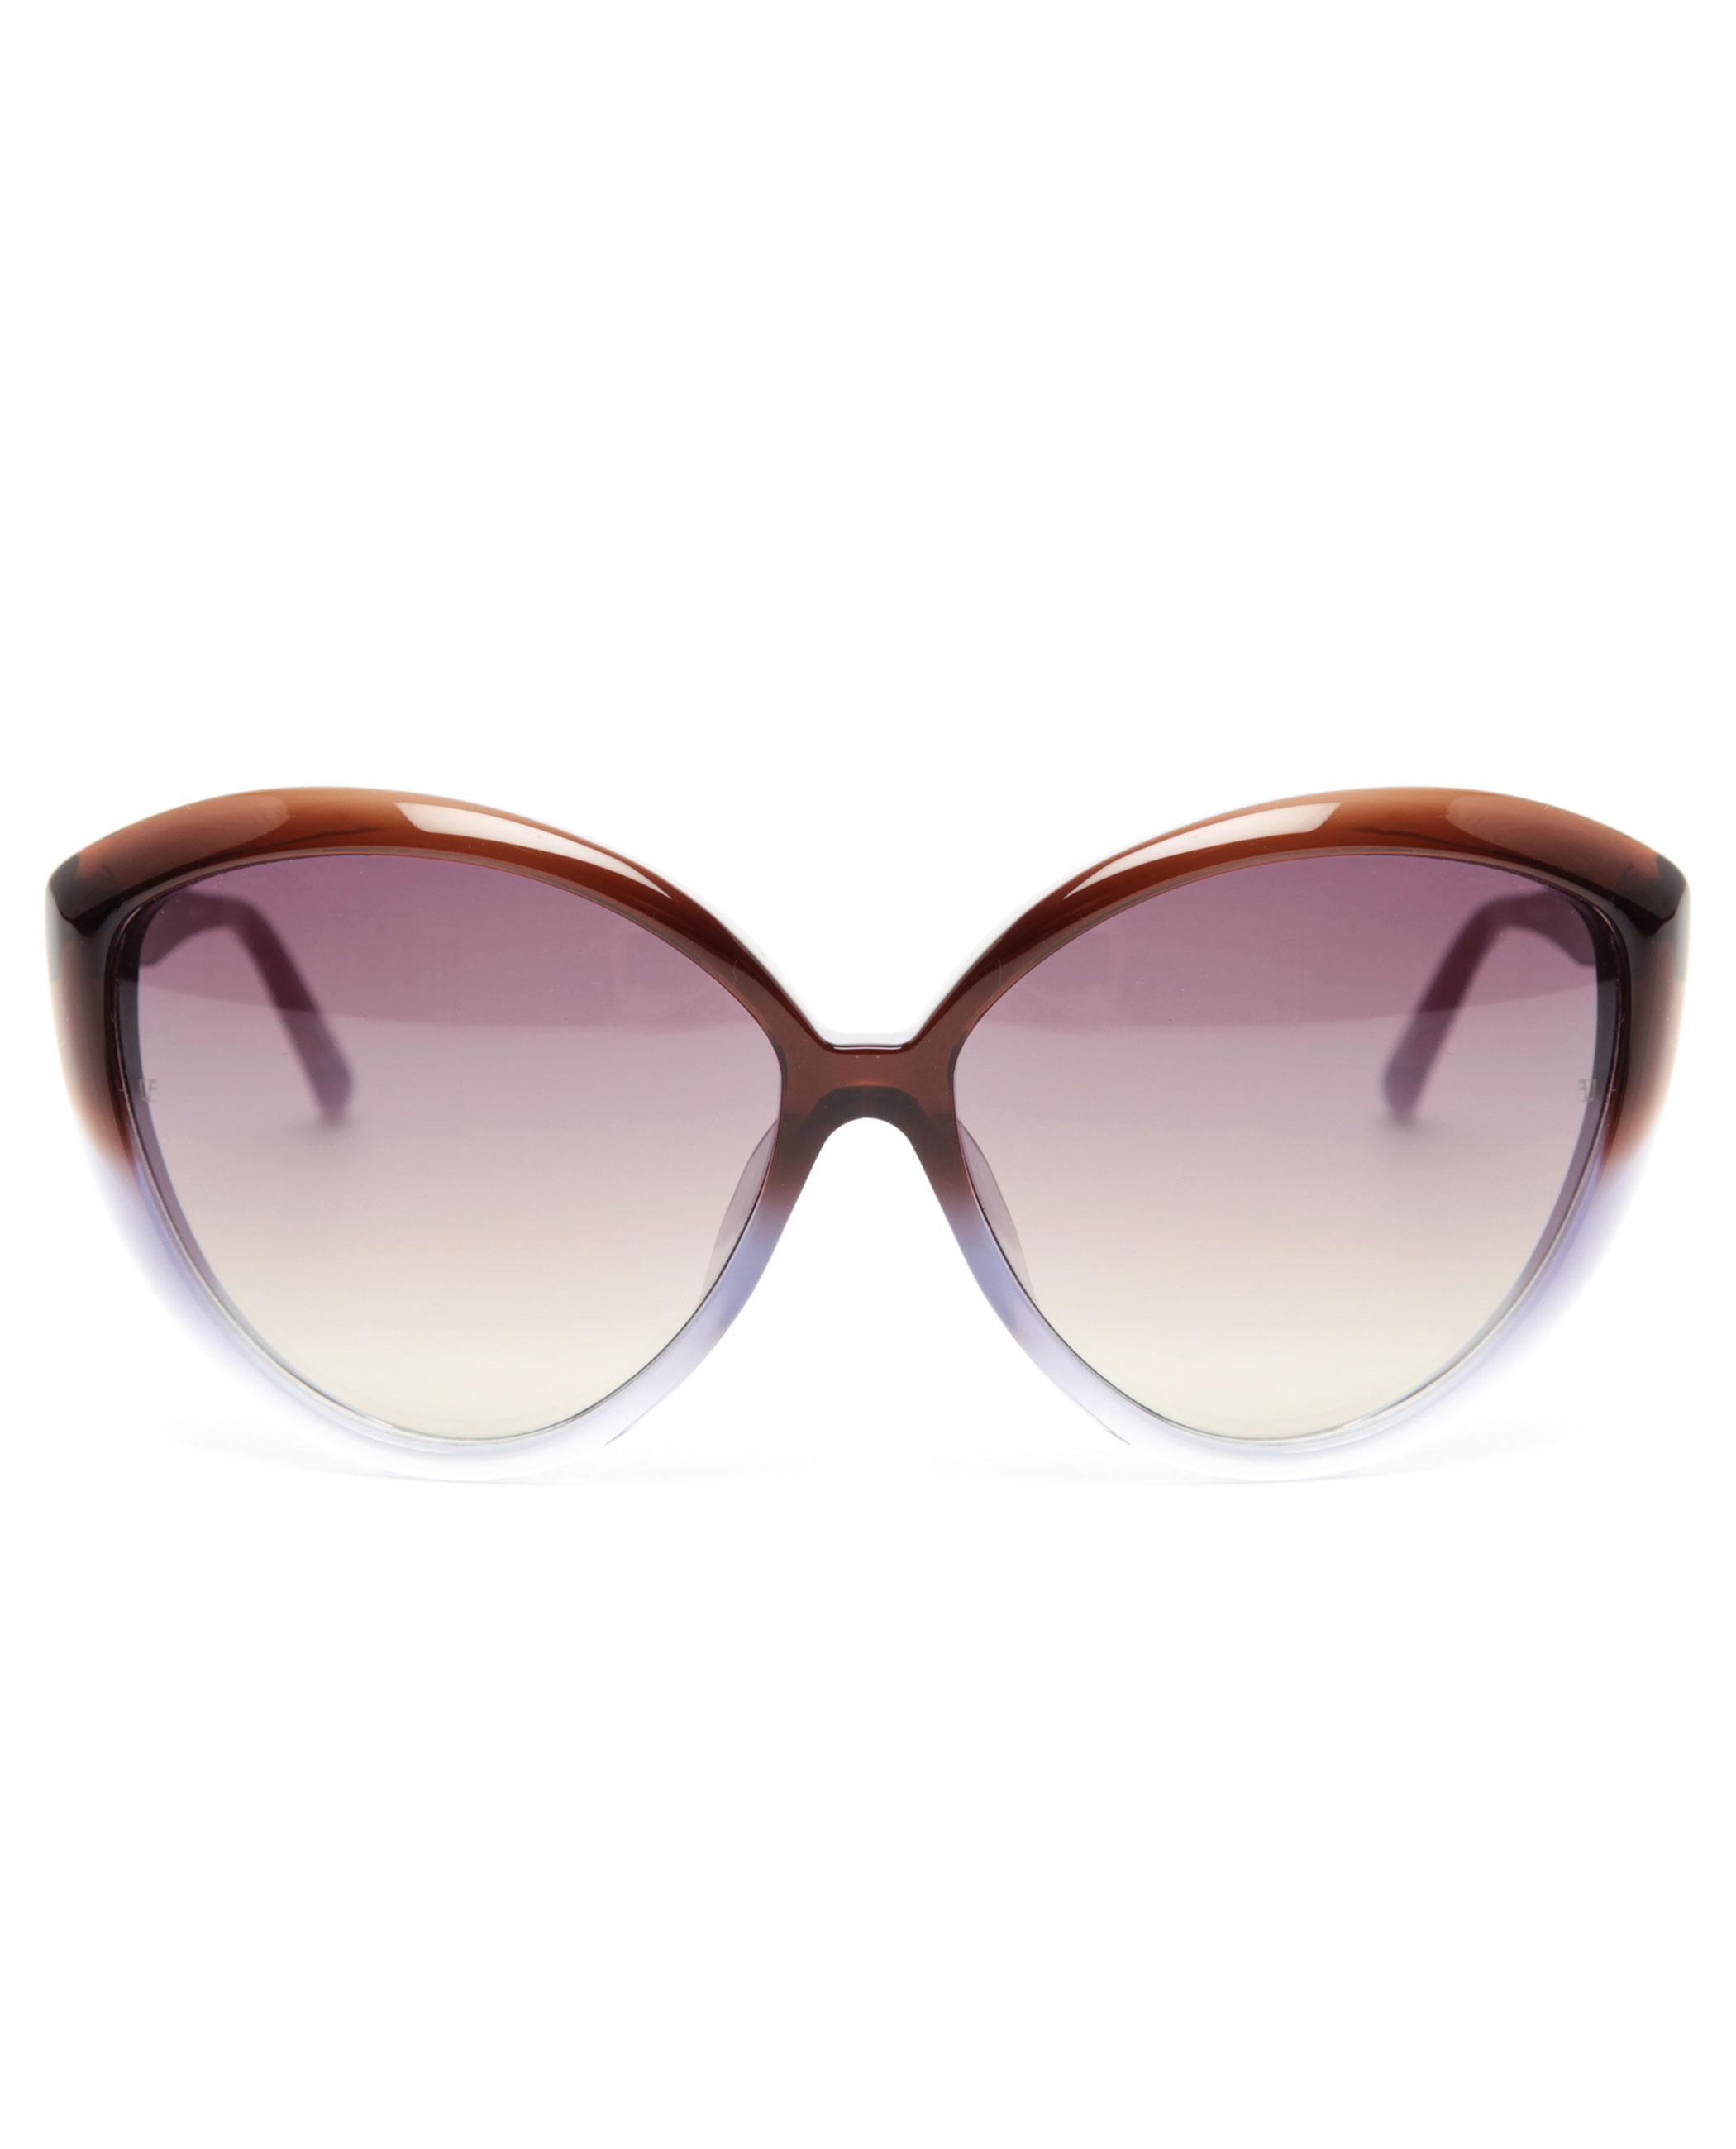 038fb5624b Linda Farrow Oversized Cat-eye Acetate Sunglasses in Brown - Lyst